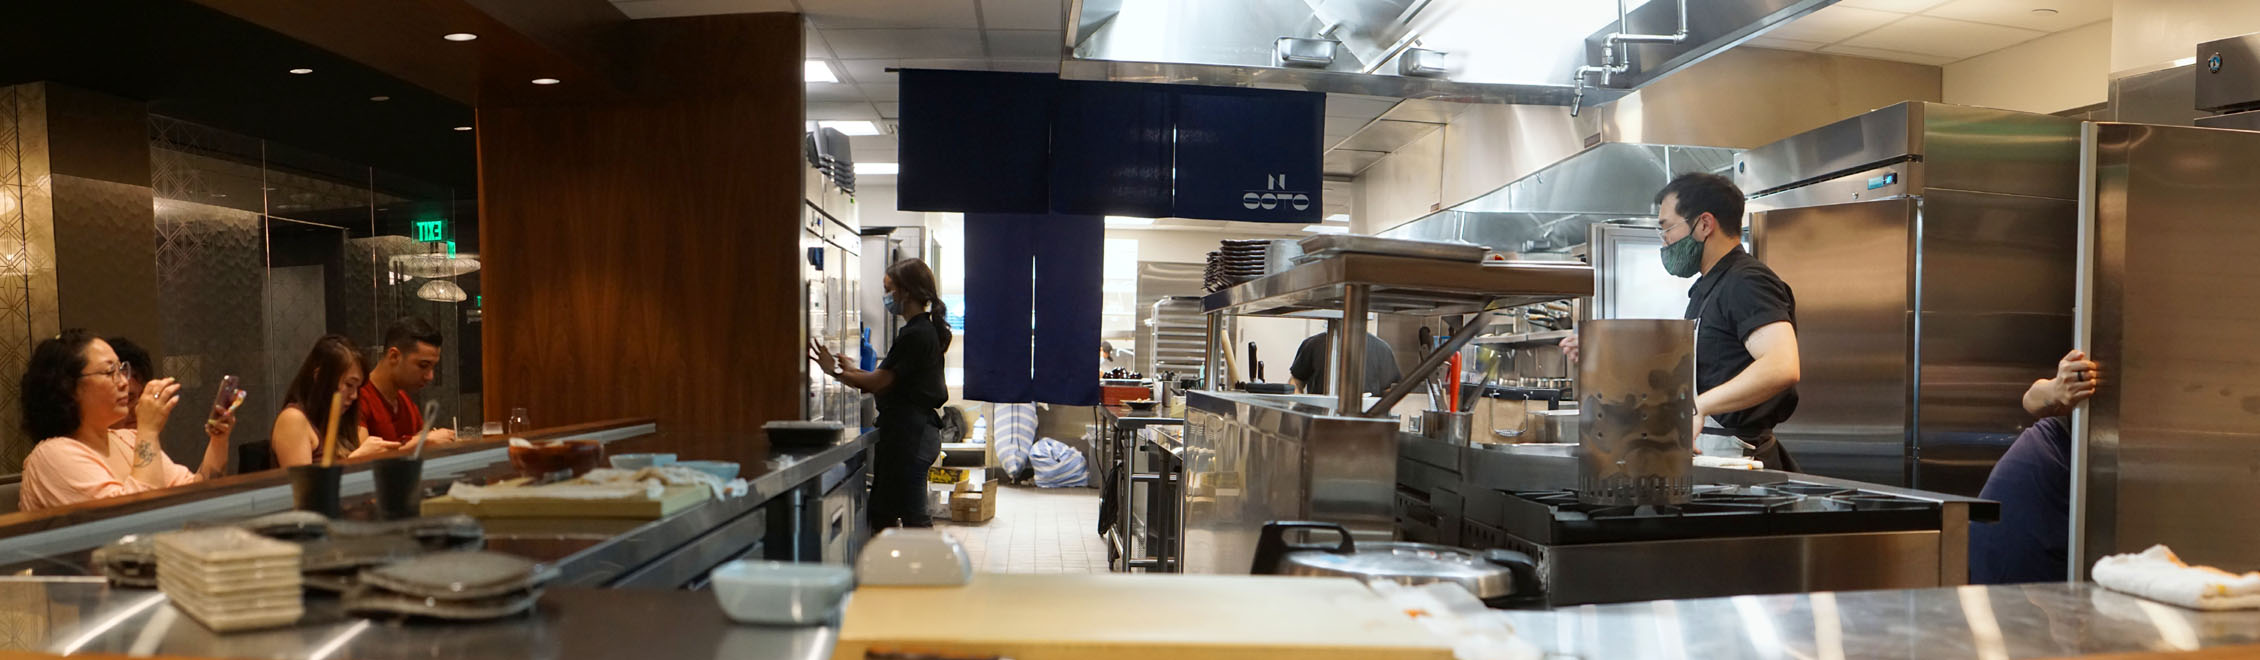 Toshizo Watanabe Culinary Cultural Center Kitchen View